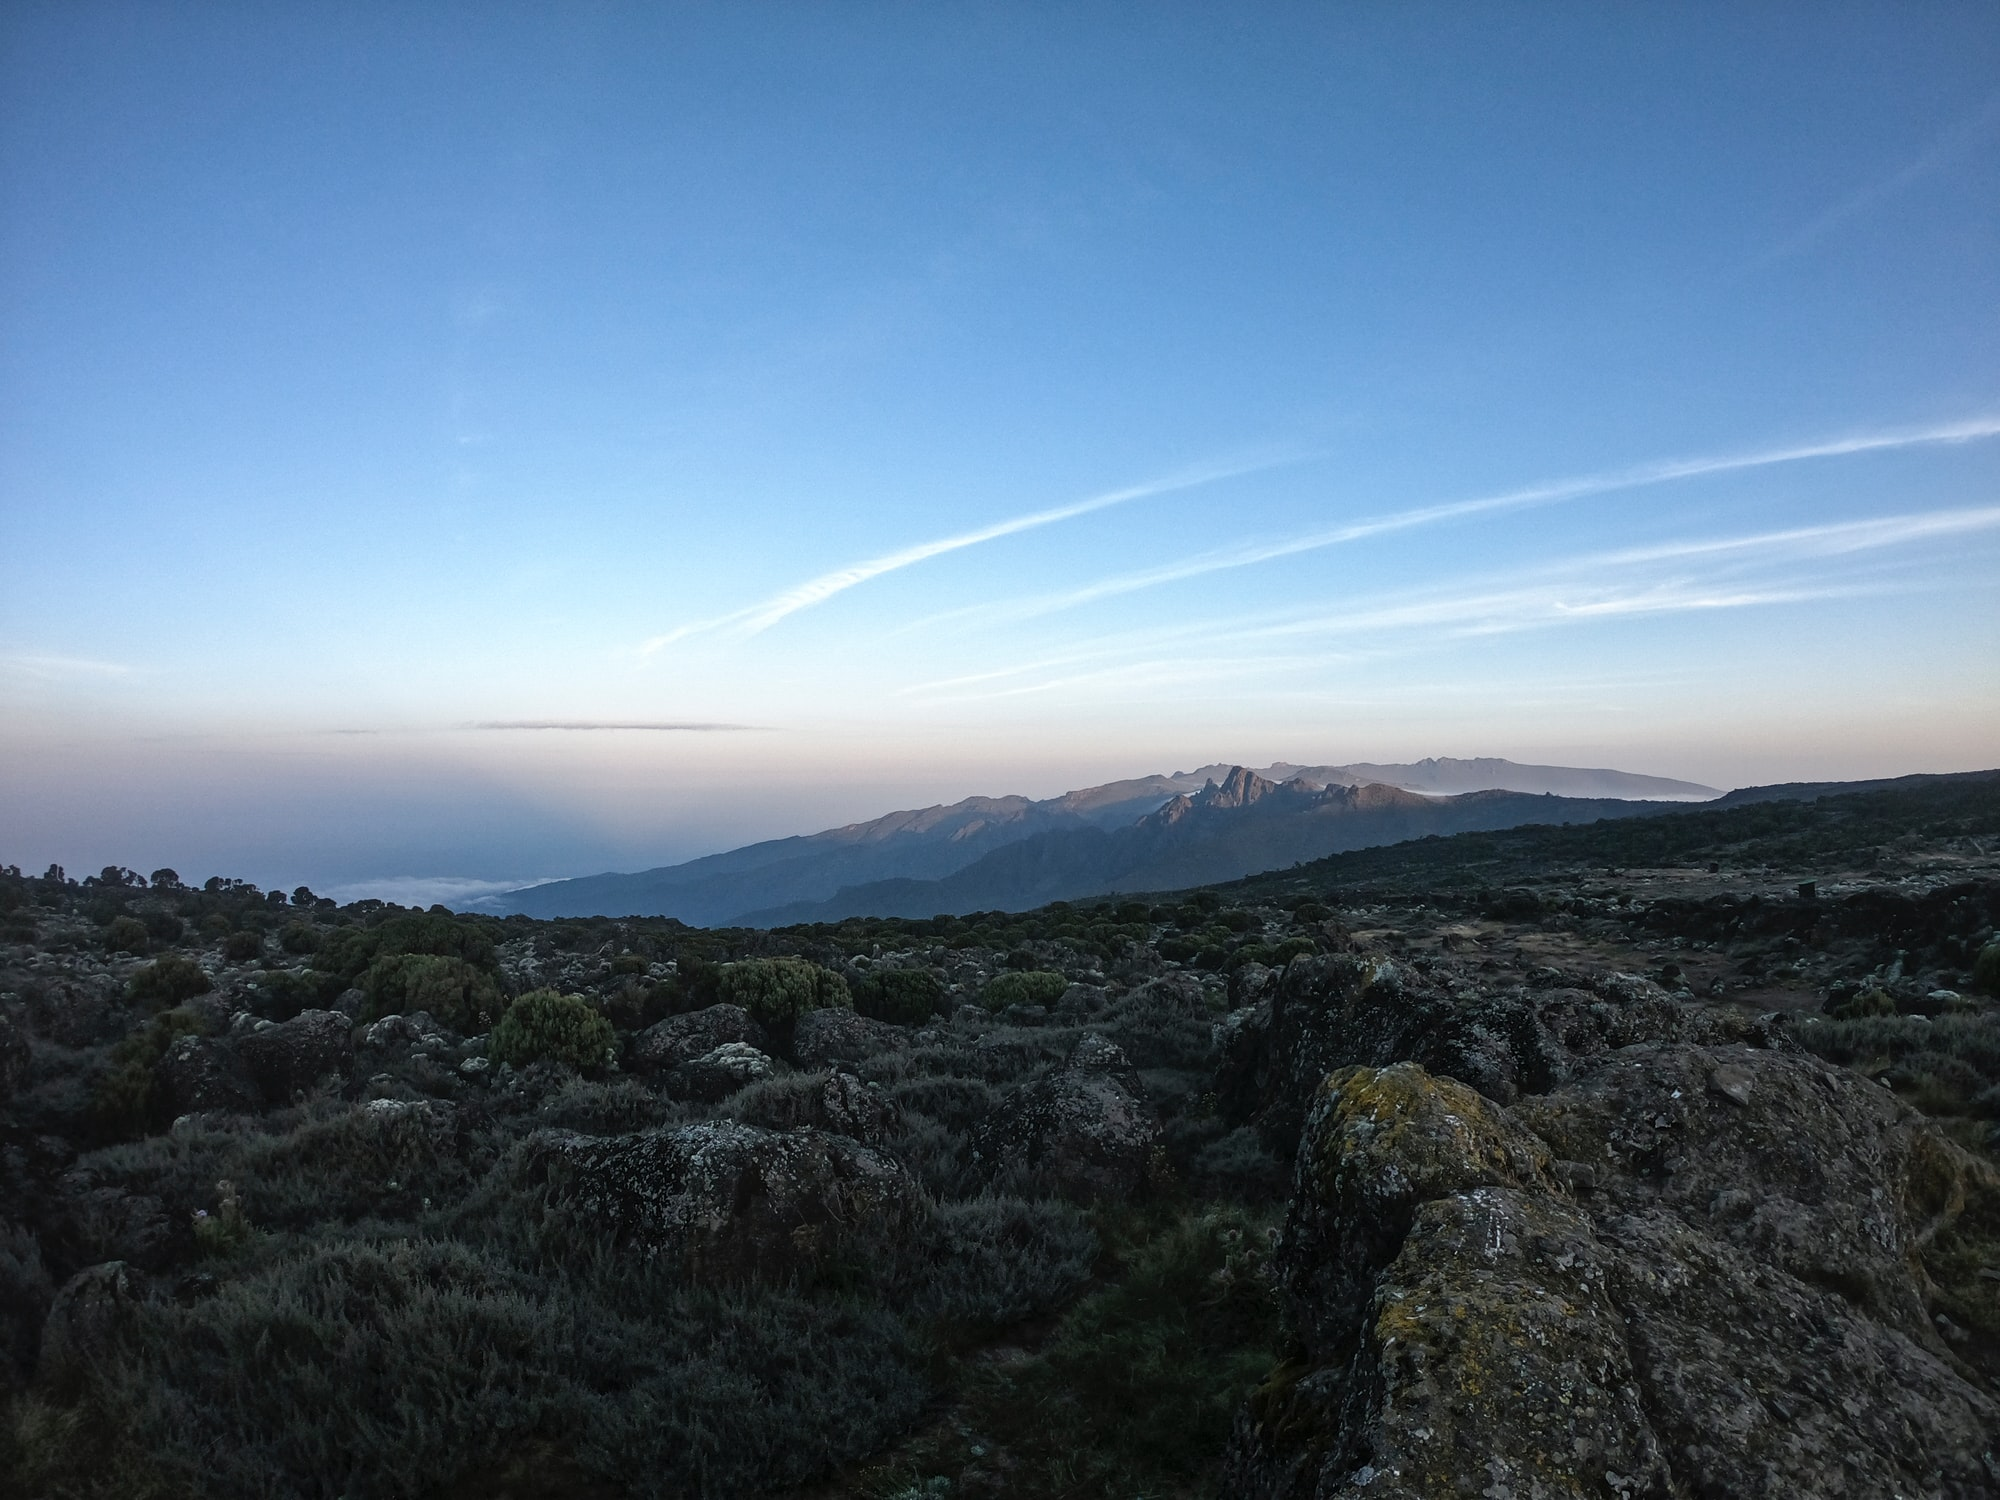 Kilimanjaro Mountain Visa